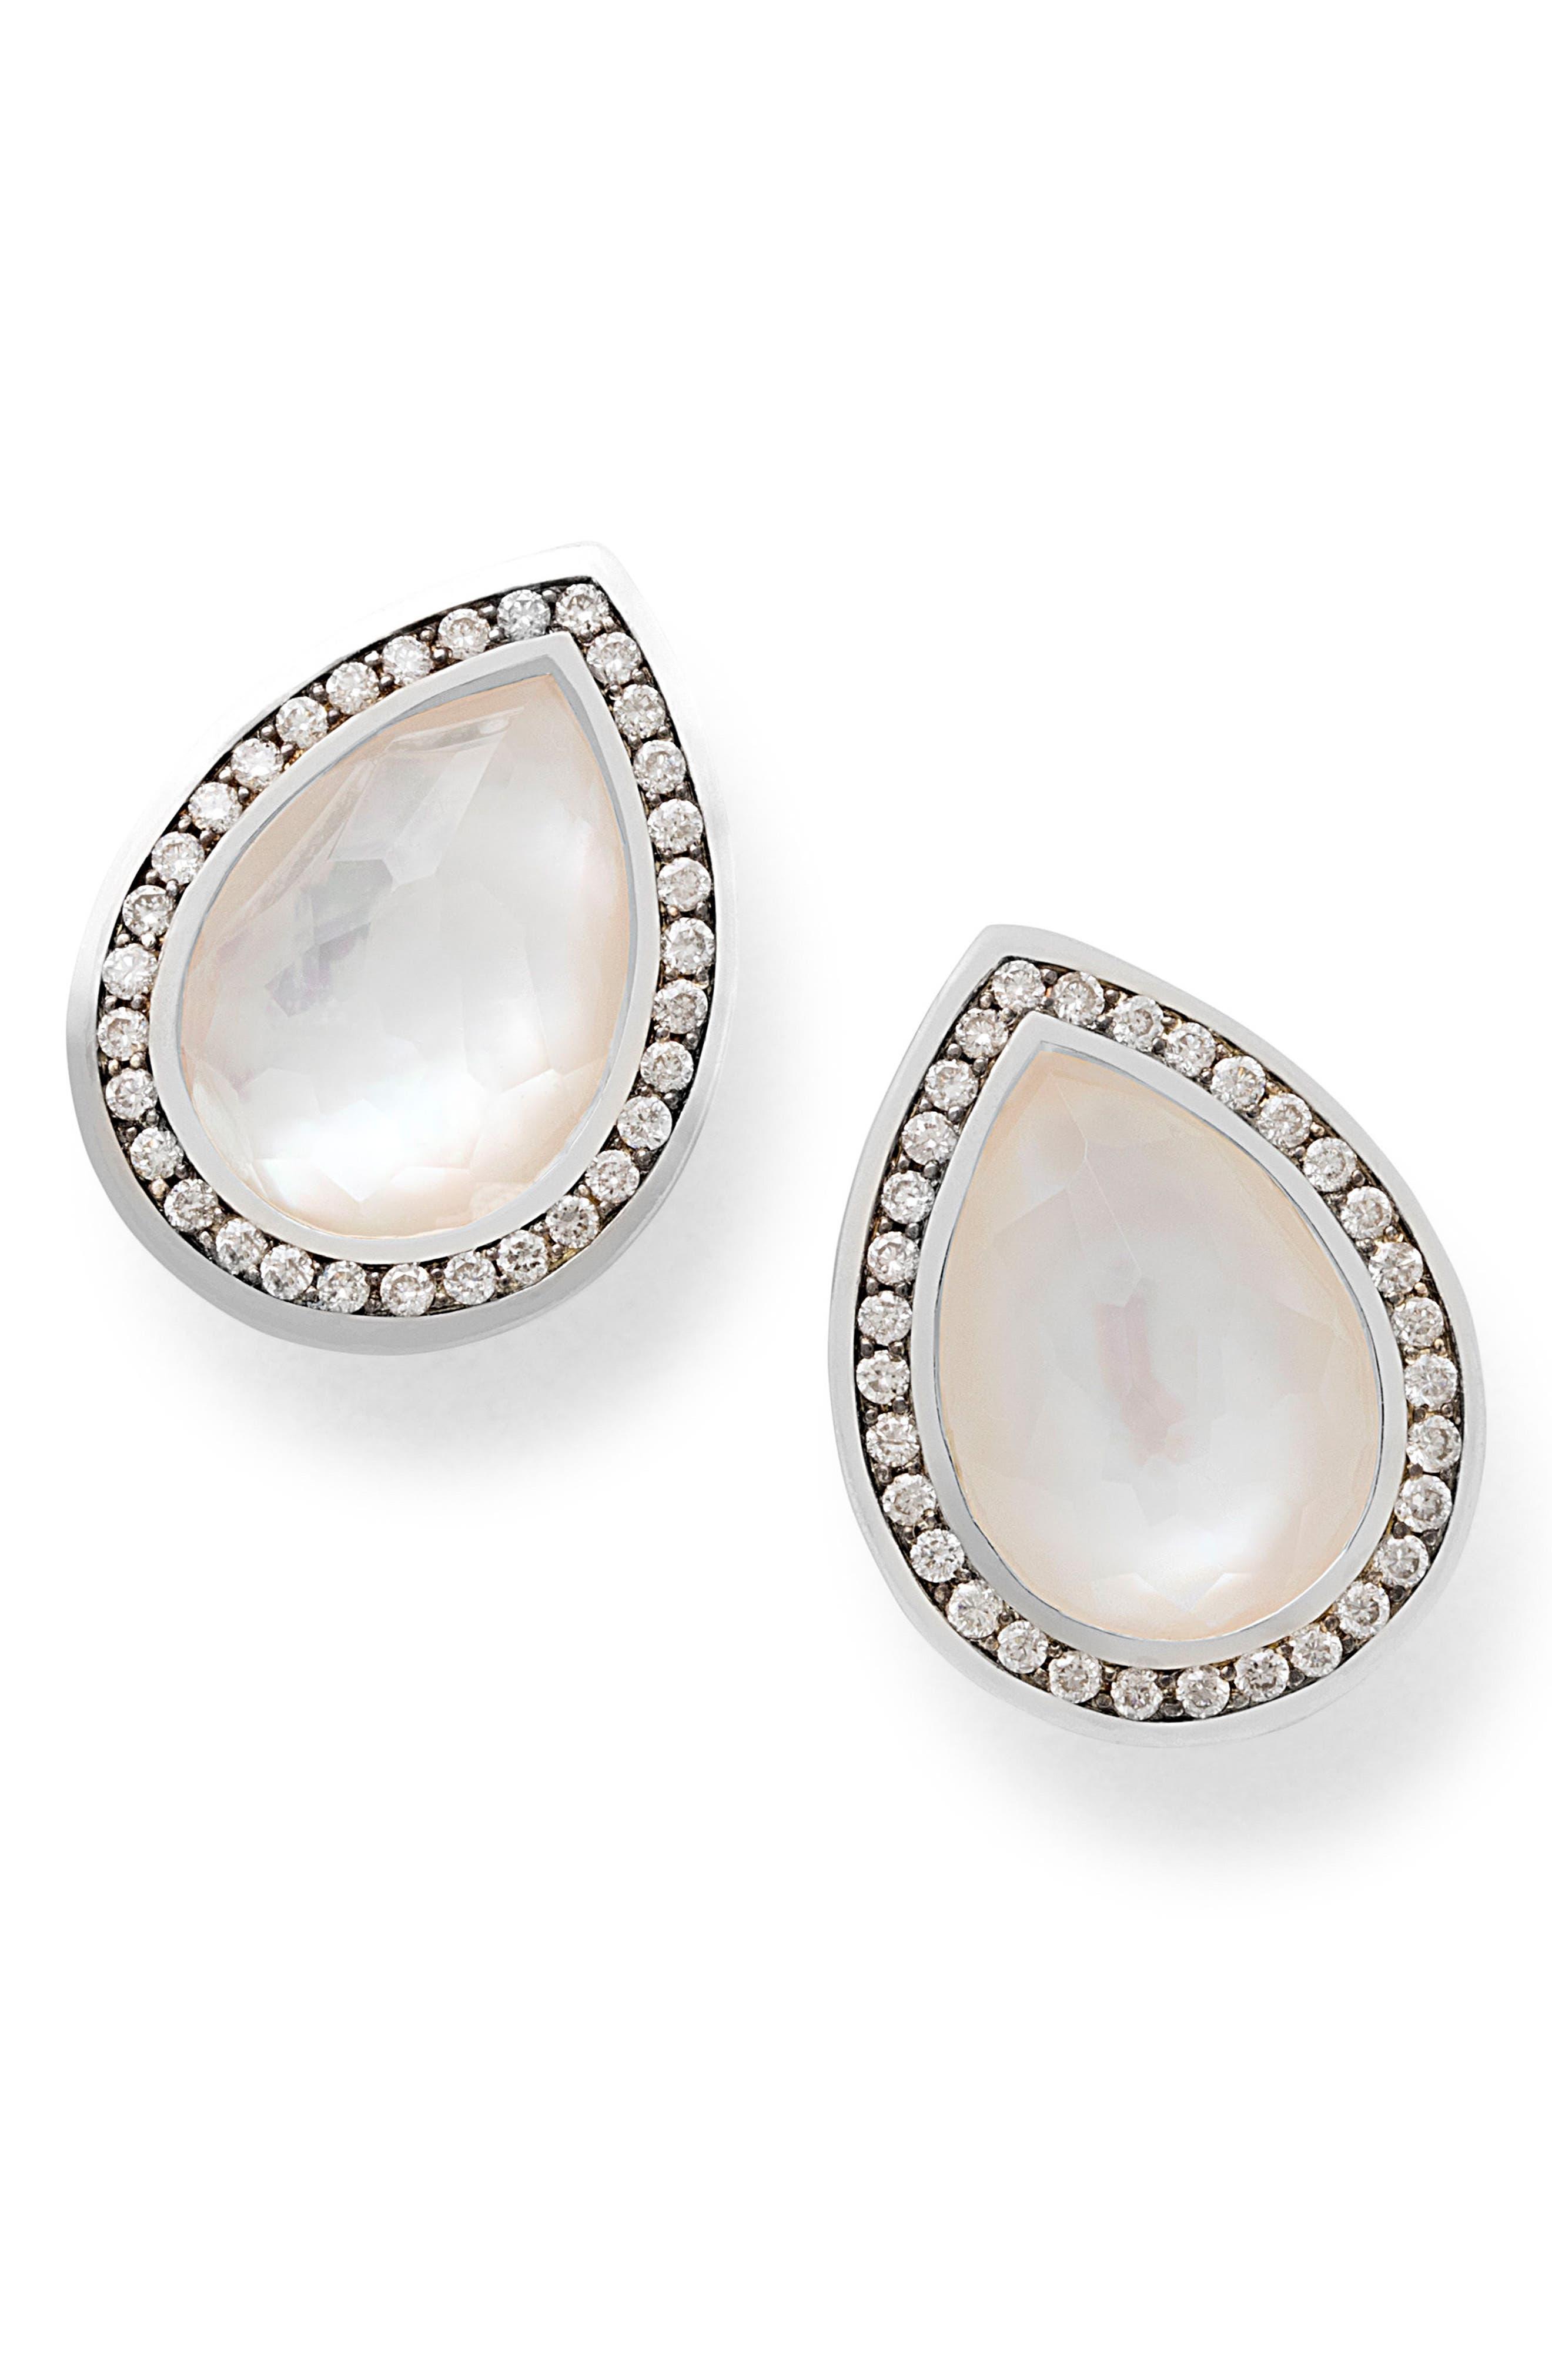 Teardrop Stud Earrings,                             Main thumbnail 1, color,                             Mother Of Pearl